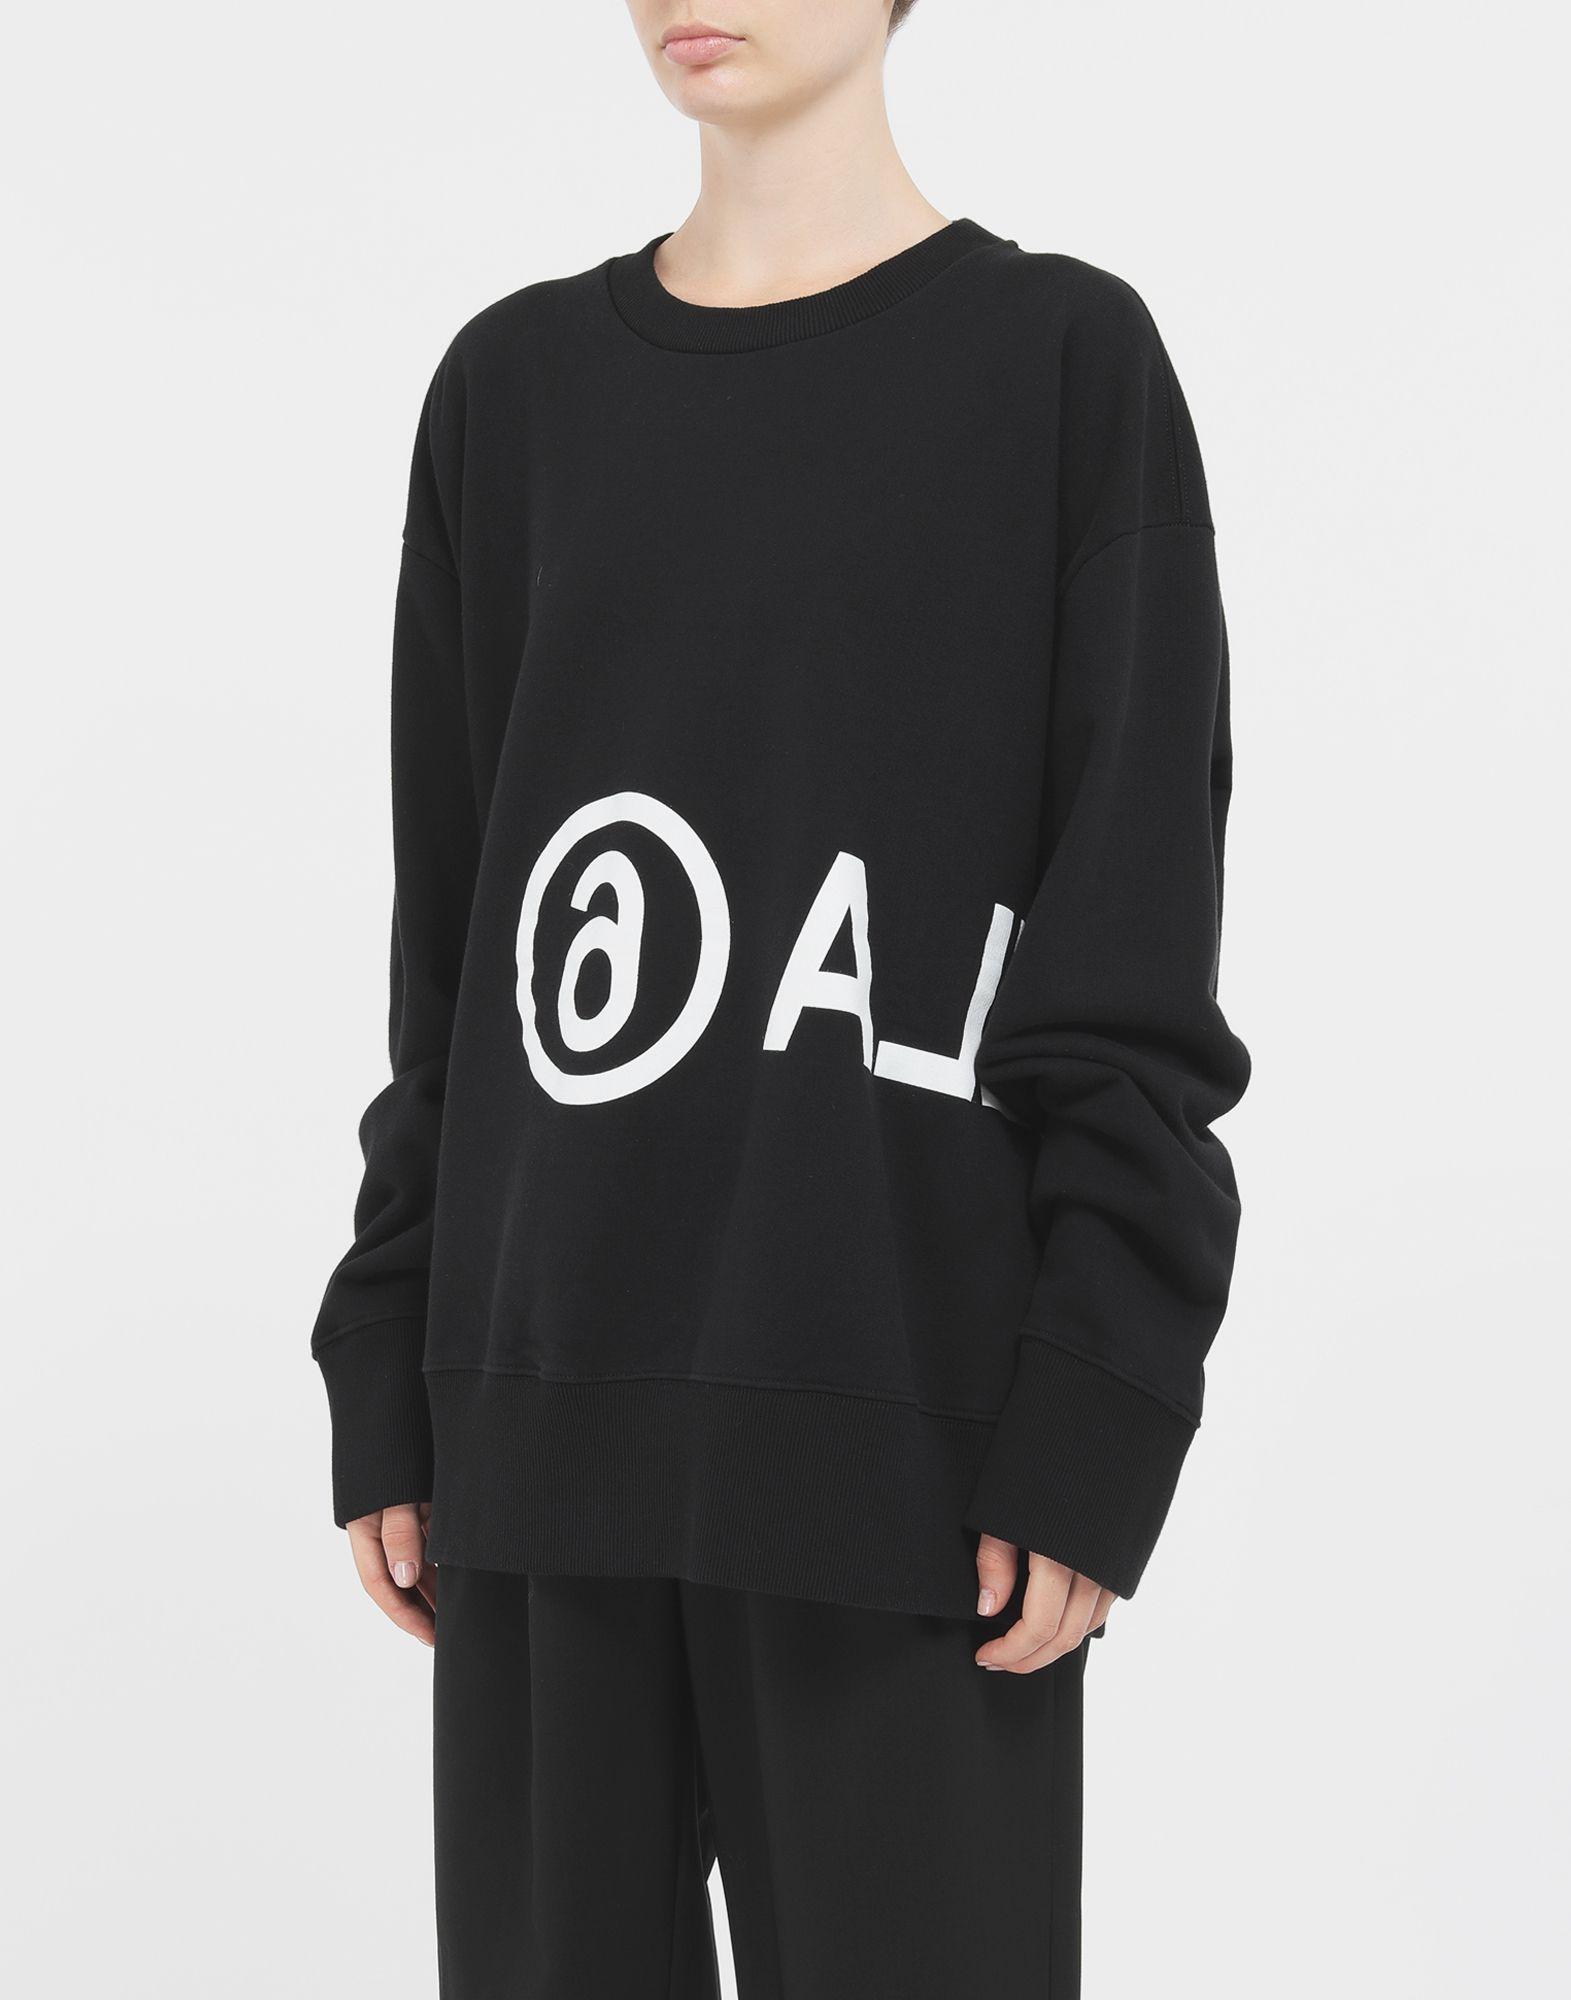 MM6 MAISON MARGIELA Reversed logo sweatshirt Sweatshirt Woman r